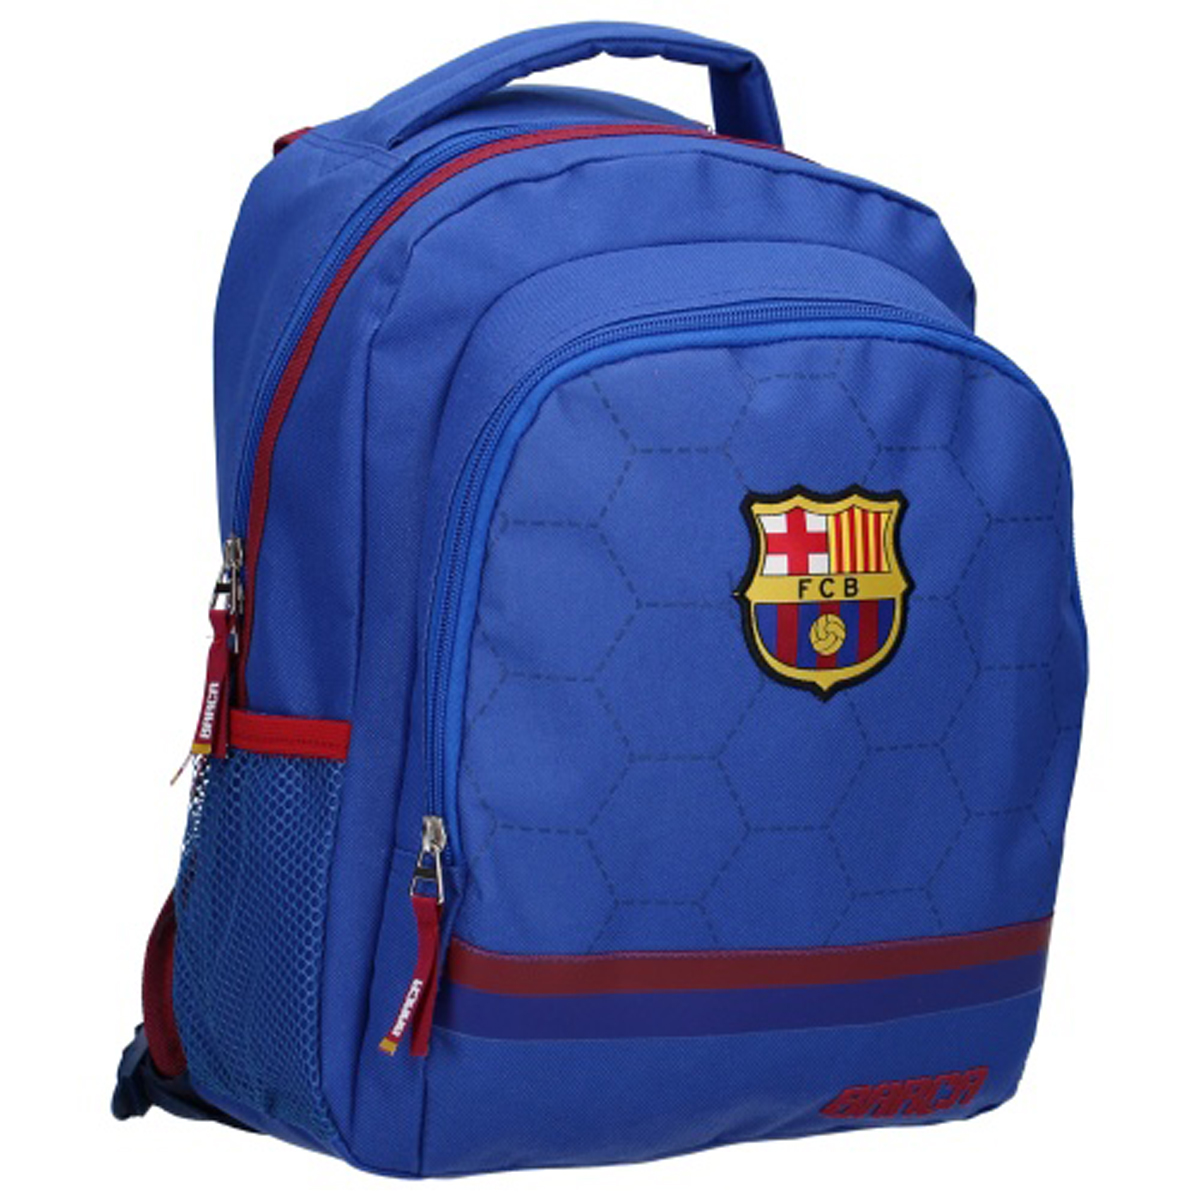 Sac à dos \'FC Barcelona\' bleu rouge - 35x27x19 cm - [Q8696]